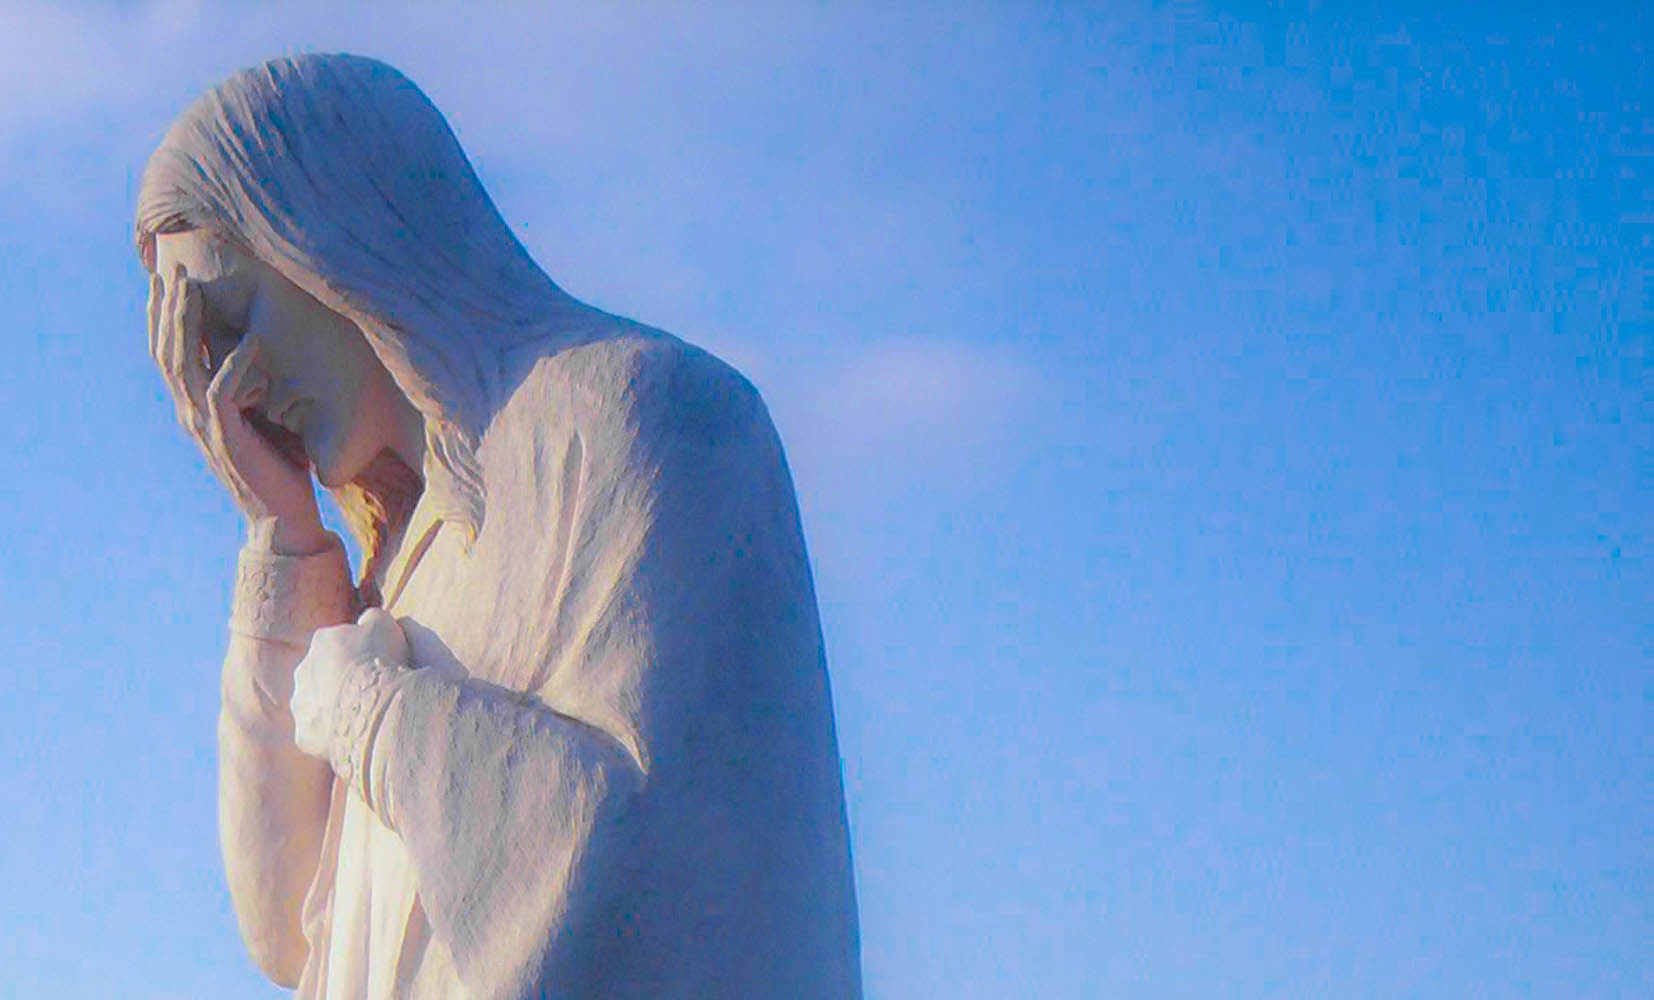 Jesus_Wept_OKC_Memorial1.jpg